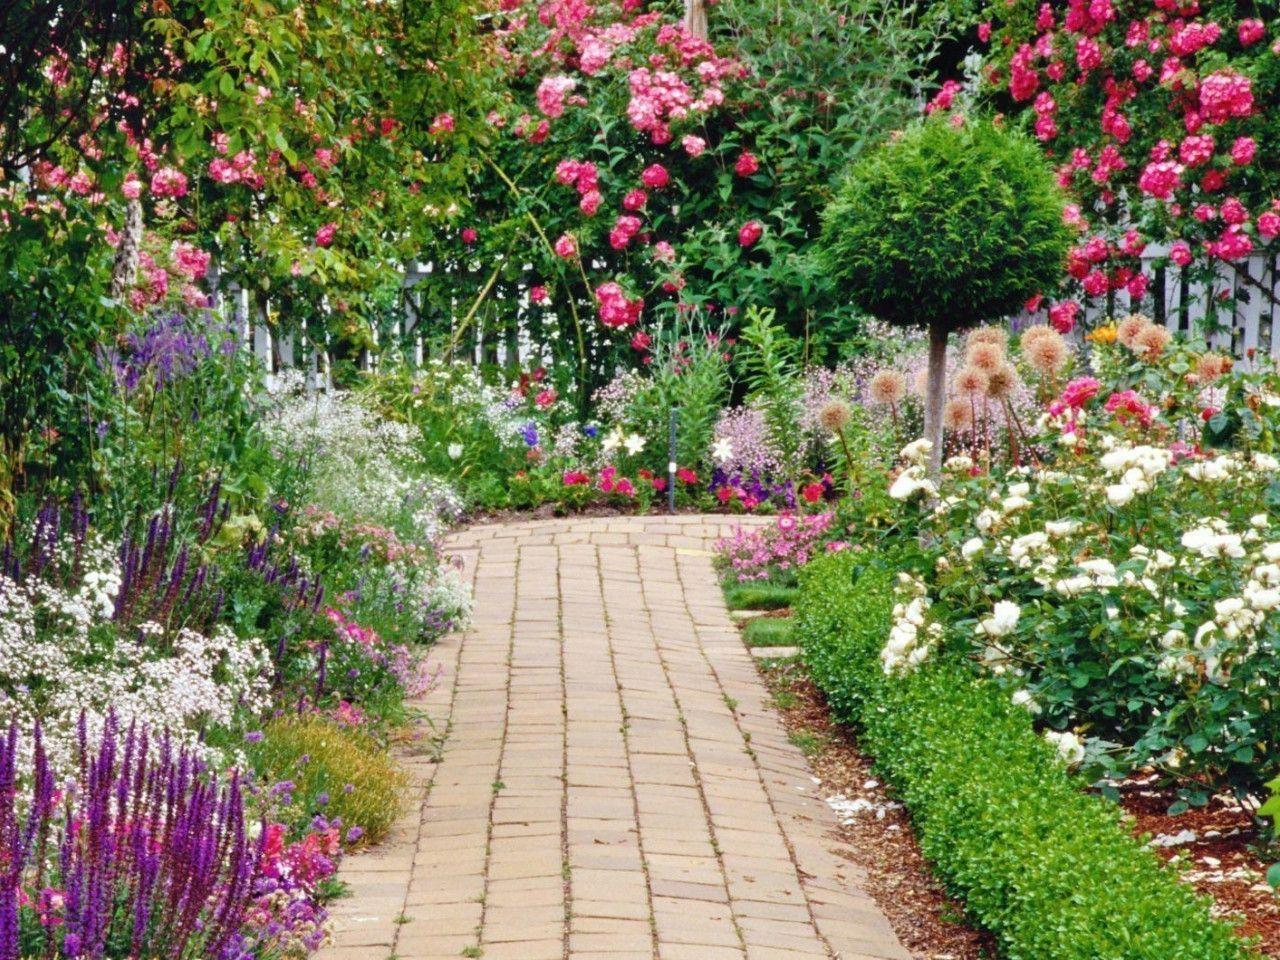 Wallpaper download garden - Flower Garden Wallpaper Download Wallpaper Green Hd Wallpaper